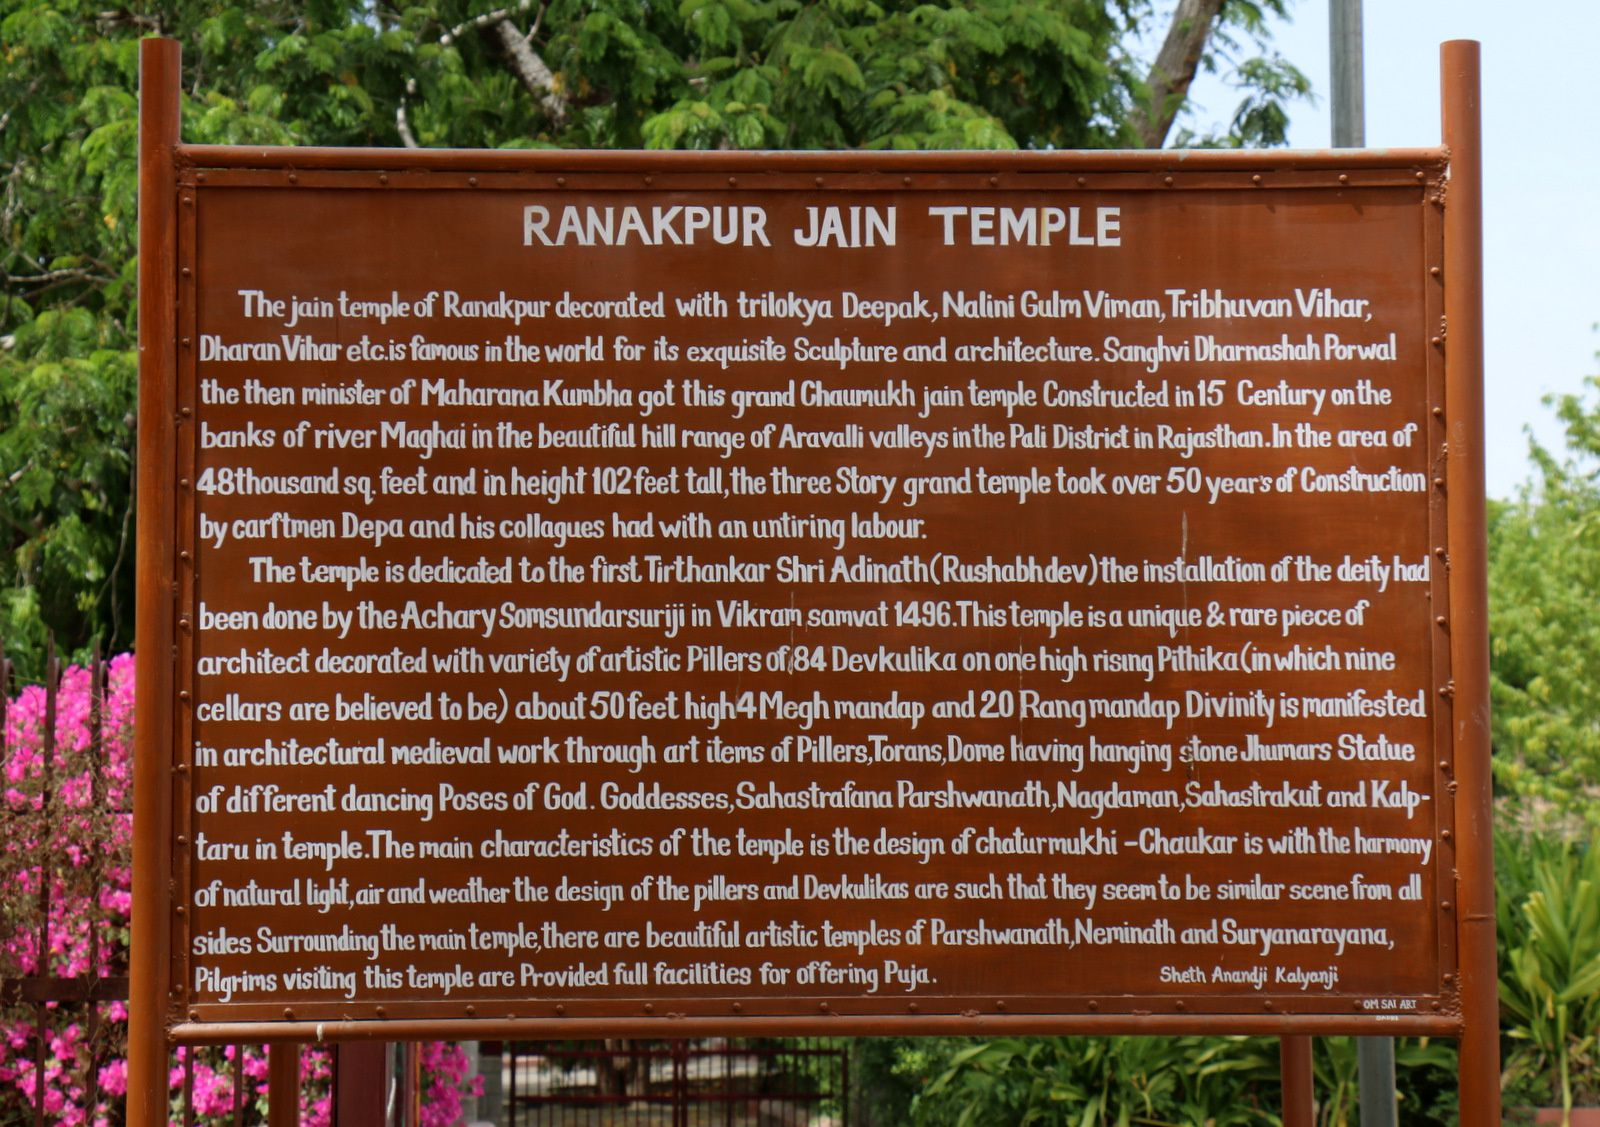 Temple jain d'Adanath, Ranakpur (Inde)